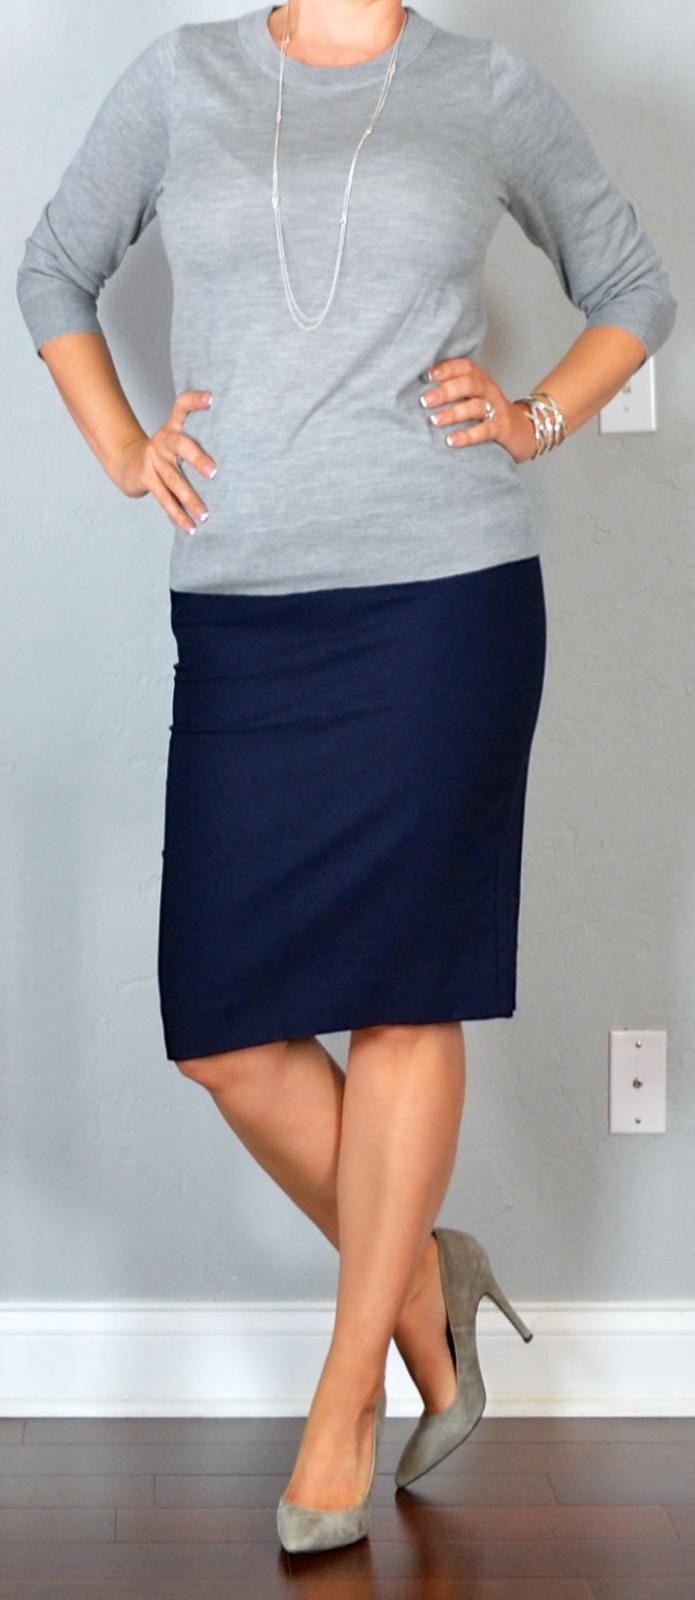 4e525231e5 outfit post  grey sweater